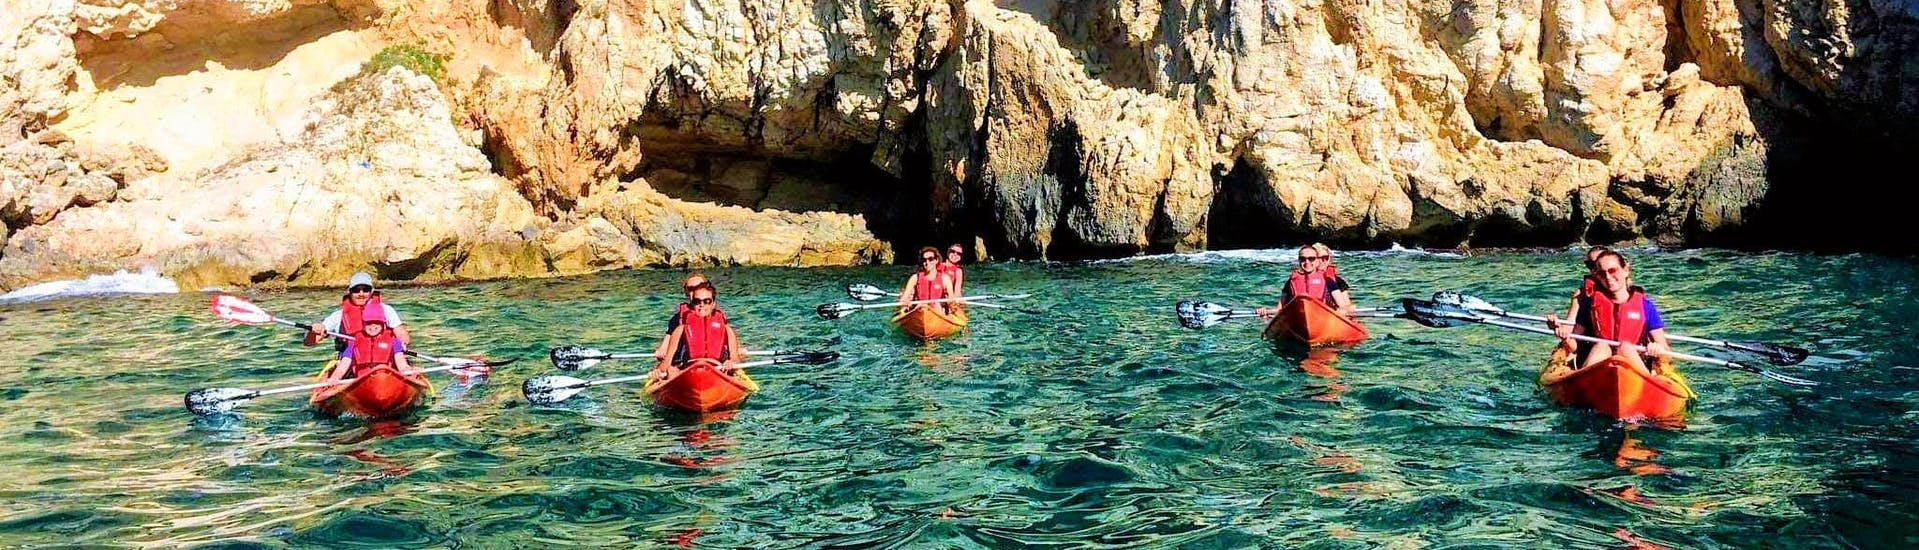 kayak-tour-to-the-caves-of-javea-with-snorkeling-siesta-advisor-javea-hero